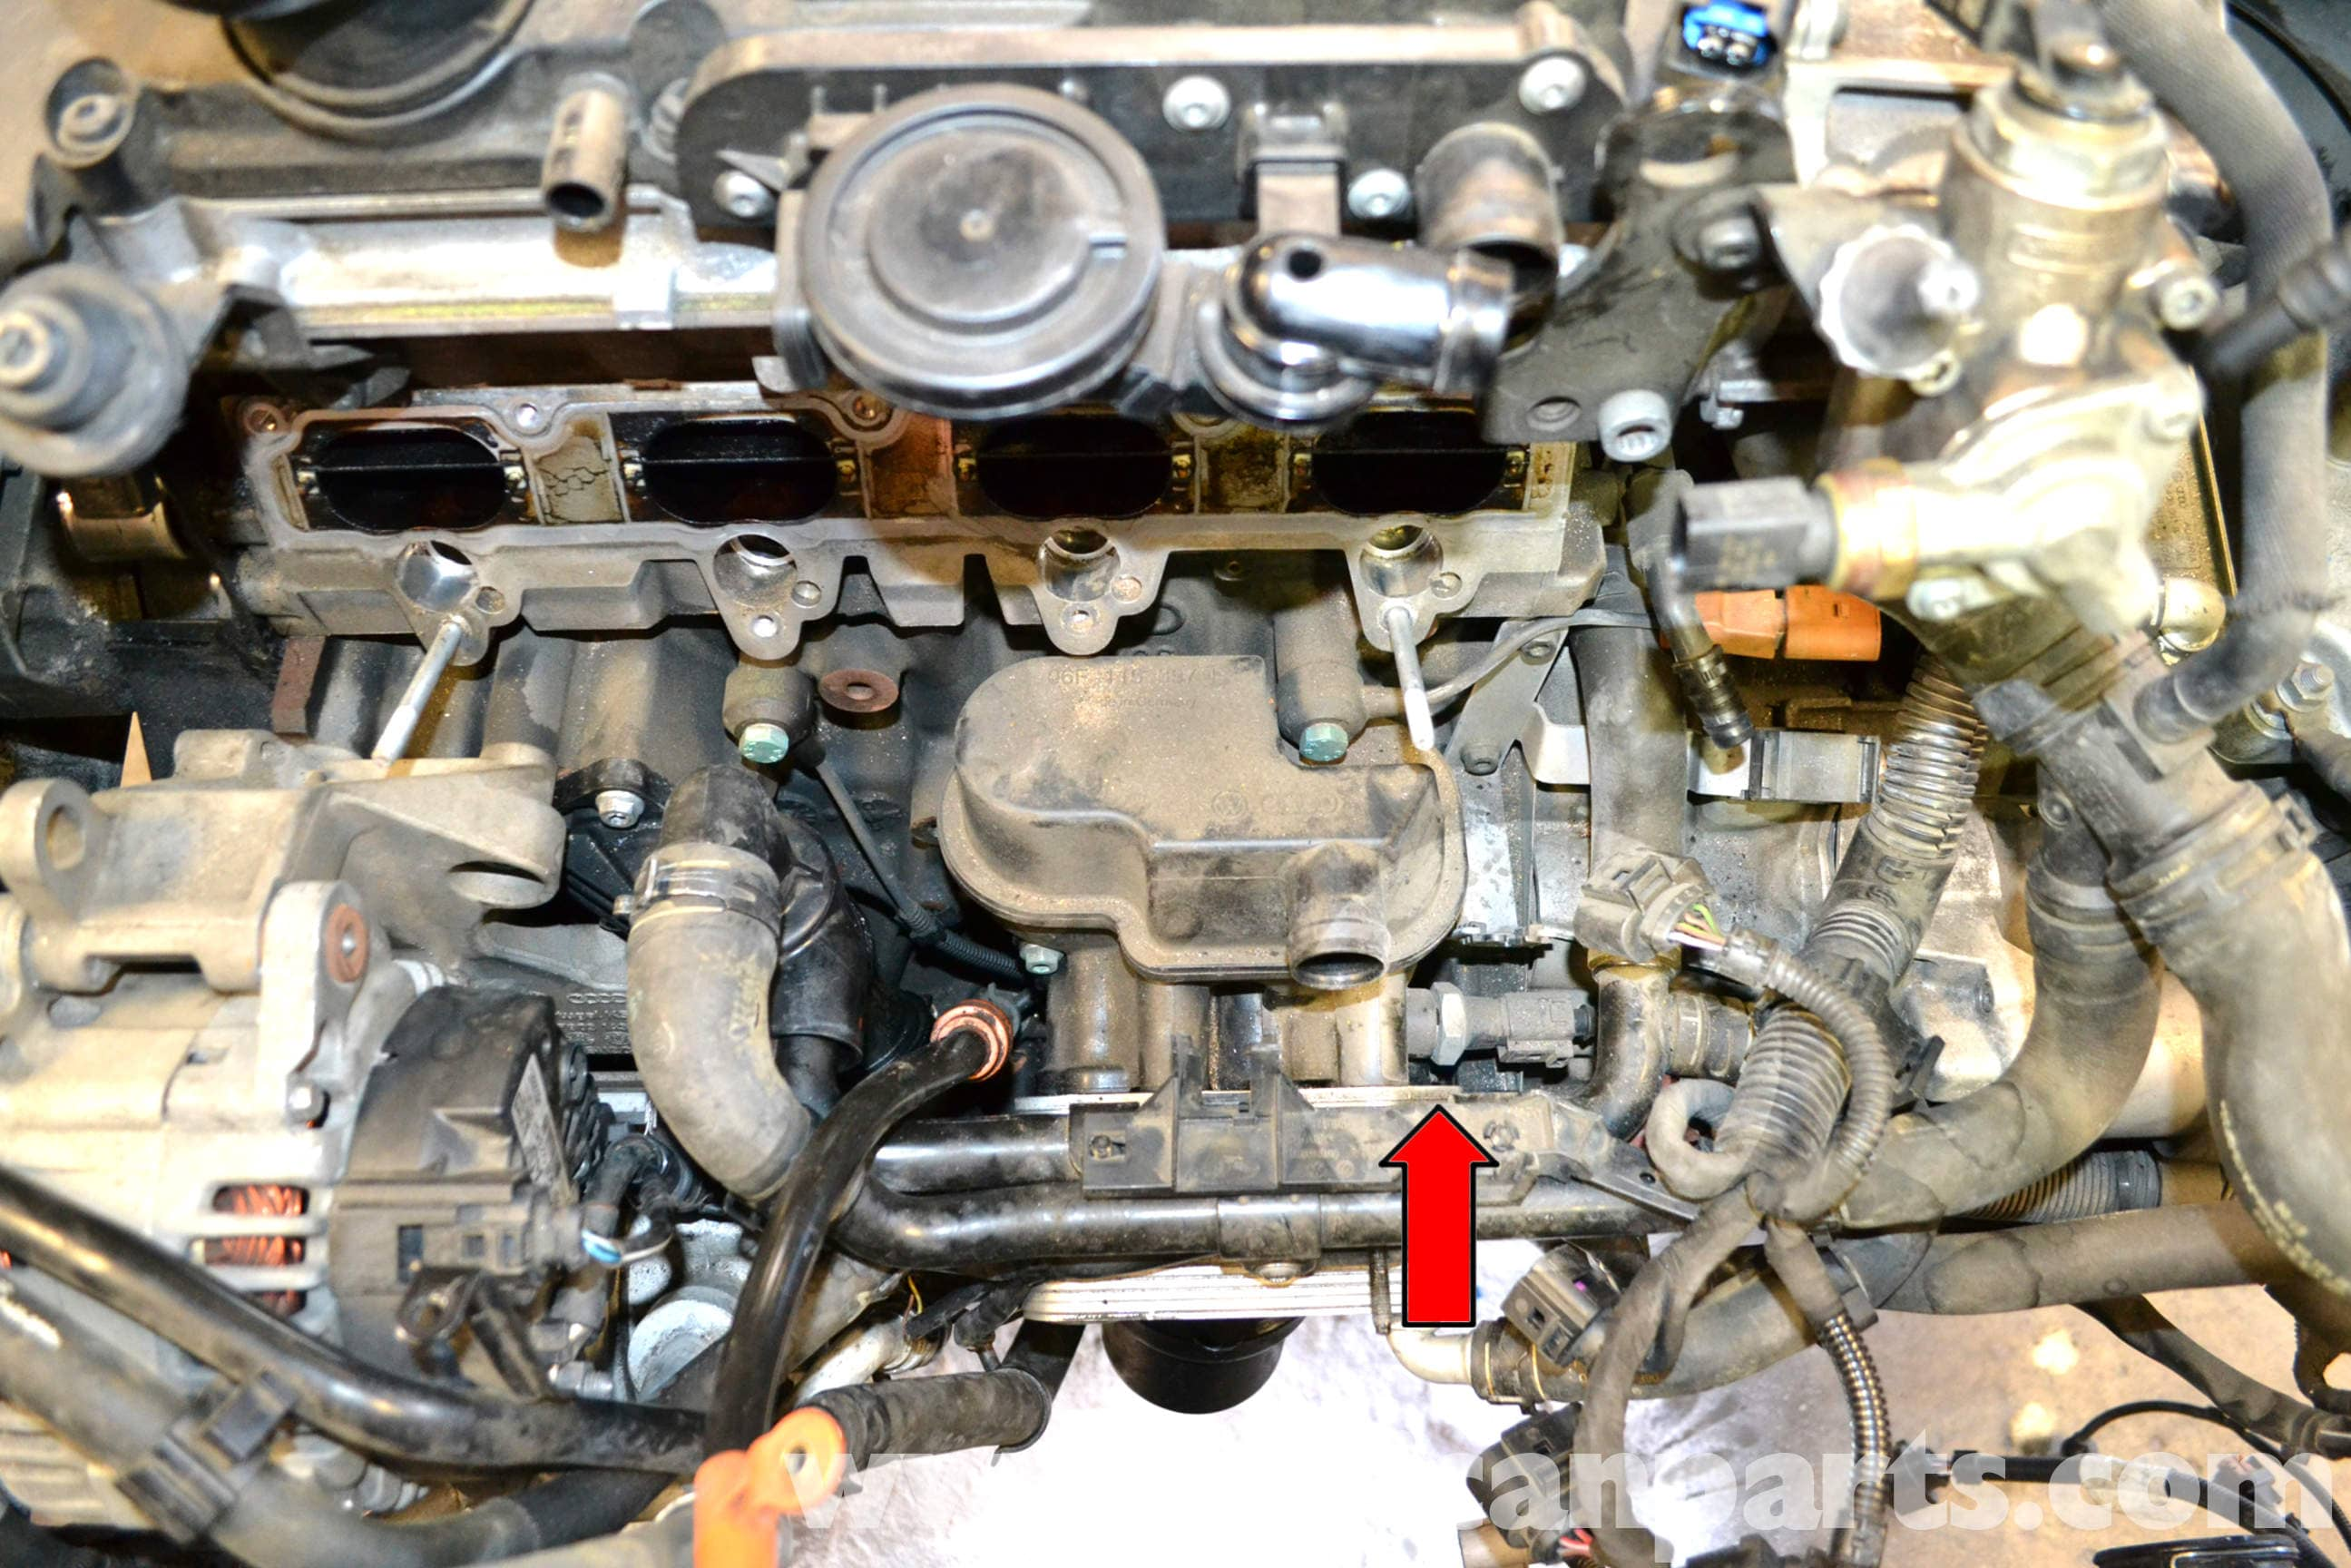 Caravan Tap Wiring Diagram Volkswagen Golf Gti Mk V Oil Pressure Switch Replacement